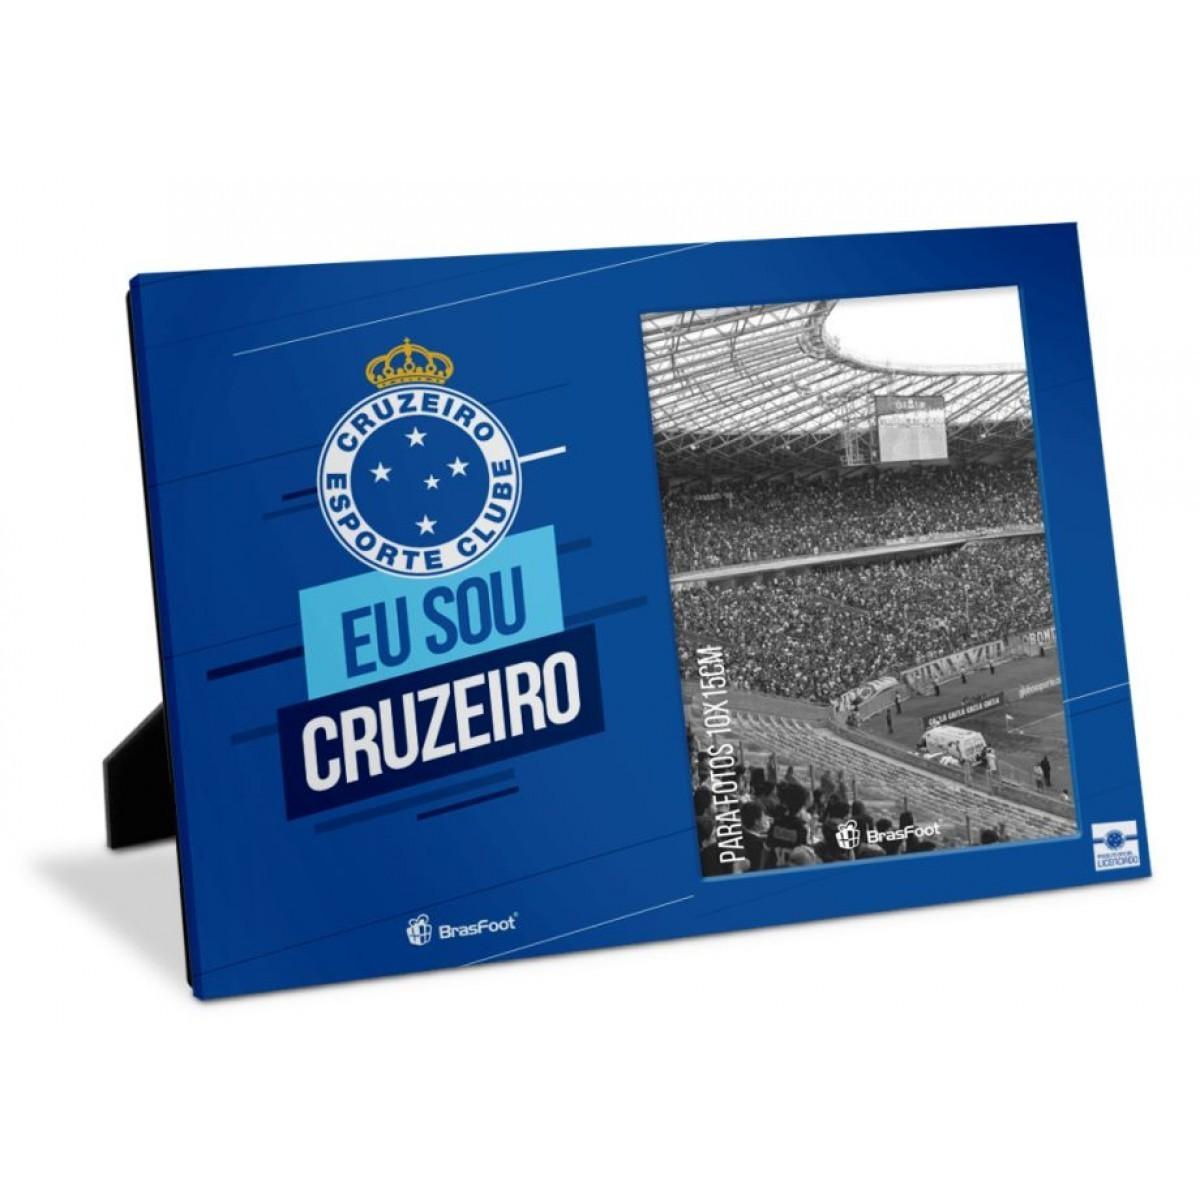 Porta Retrato Foto 10x15cm - Cruzeiro Presente Torcedor Brasfoot